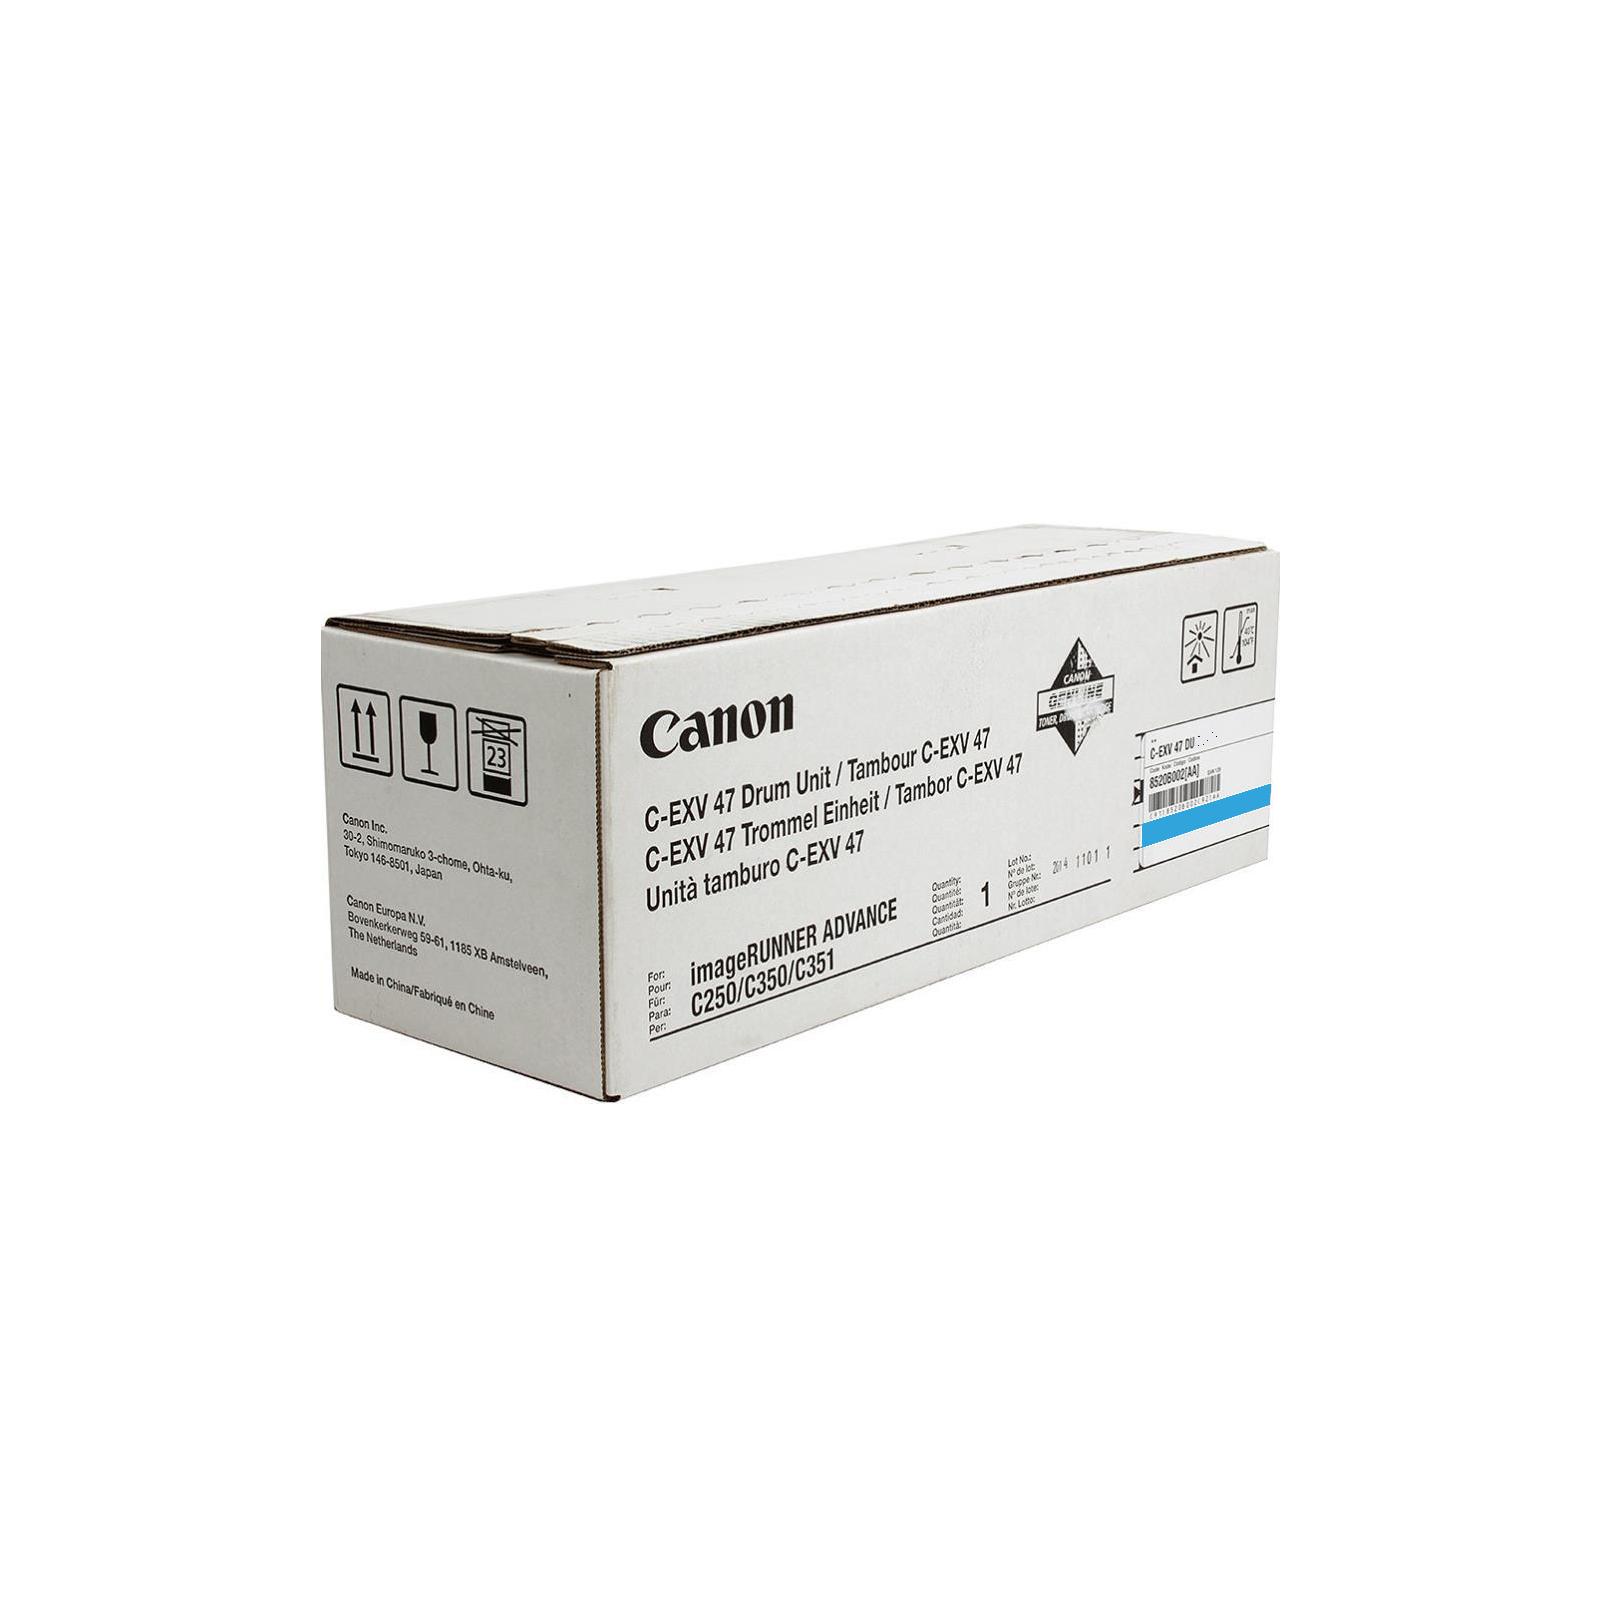 Оптический блок (Drum) Canon C-EXV47 iR Adv 350/250/С1325 Cyan (8521B002)